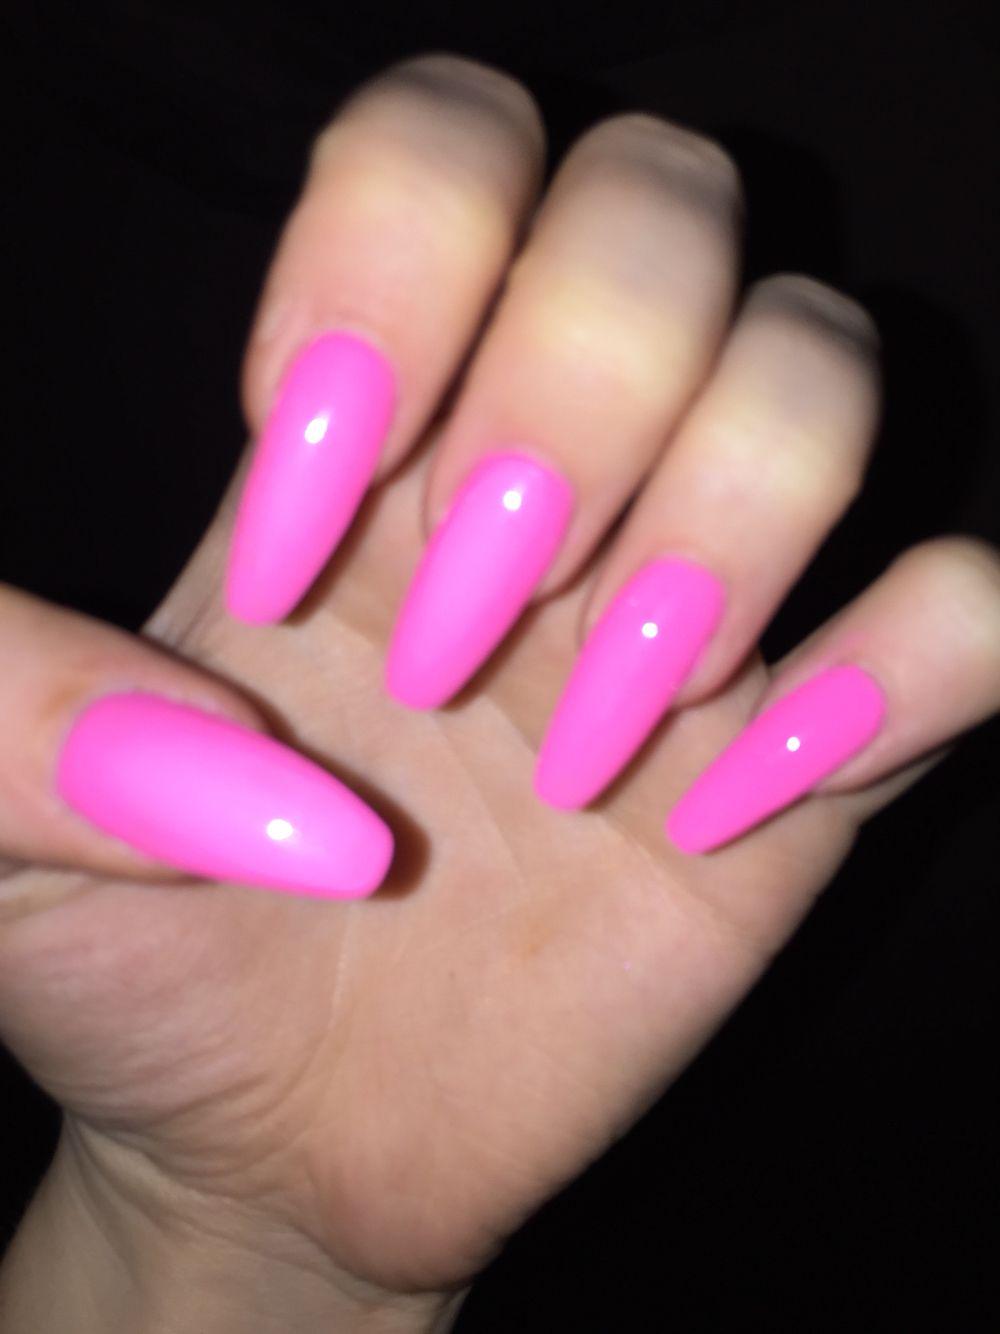 acrylic nails neon pink photo - 2